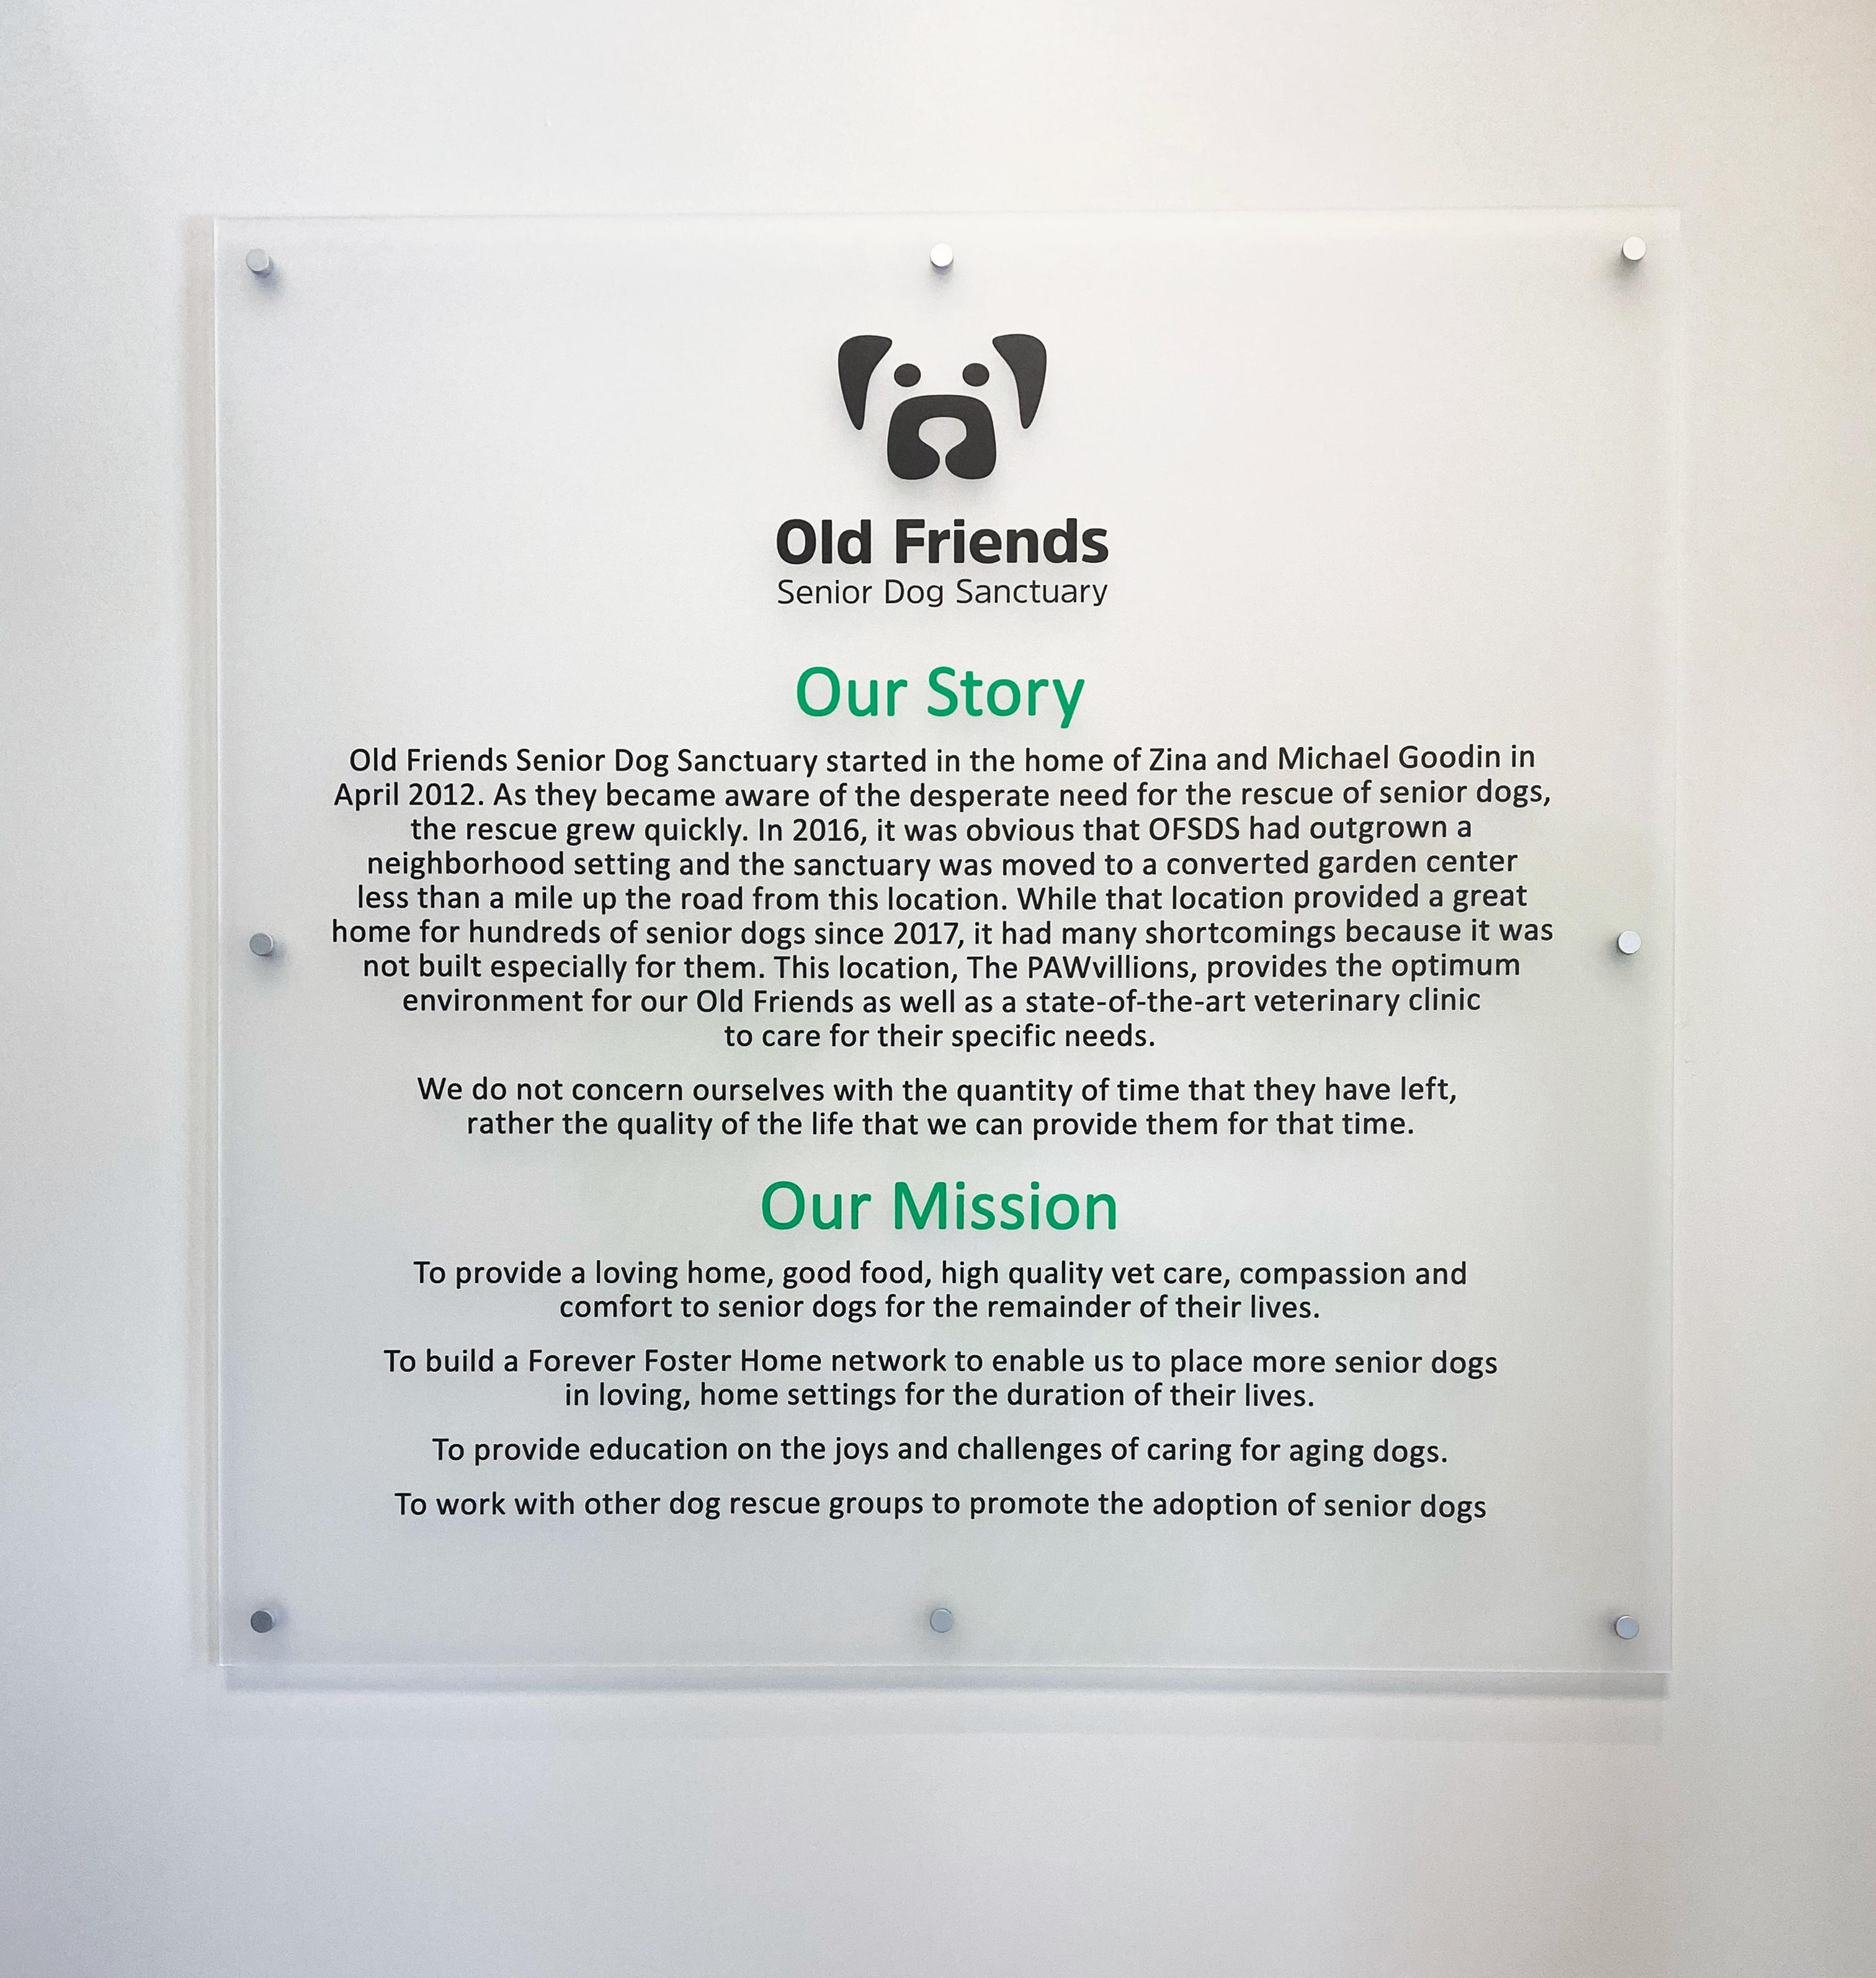 Photo of Vivid signage at dog sancuary